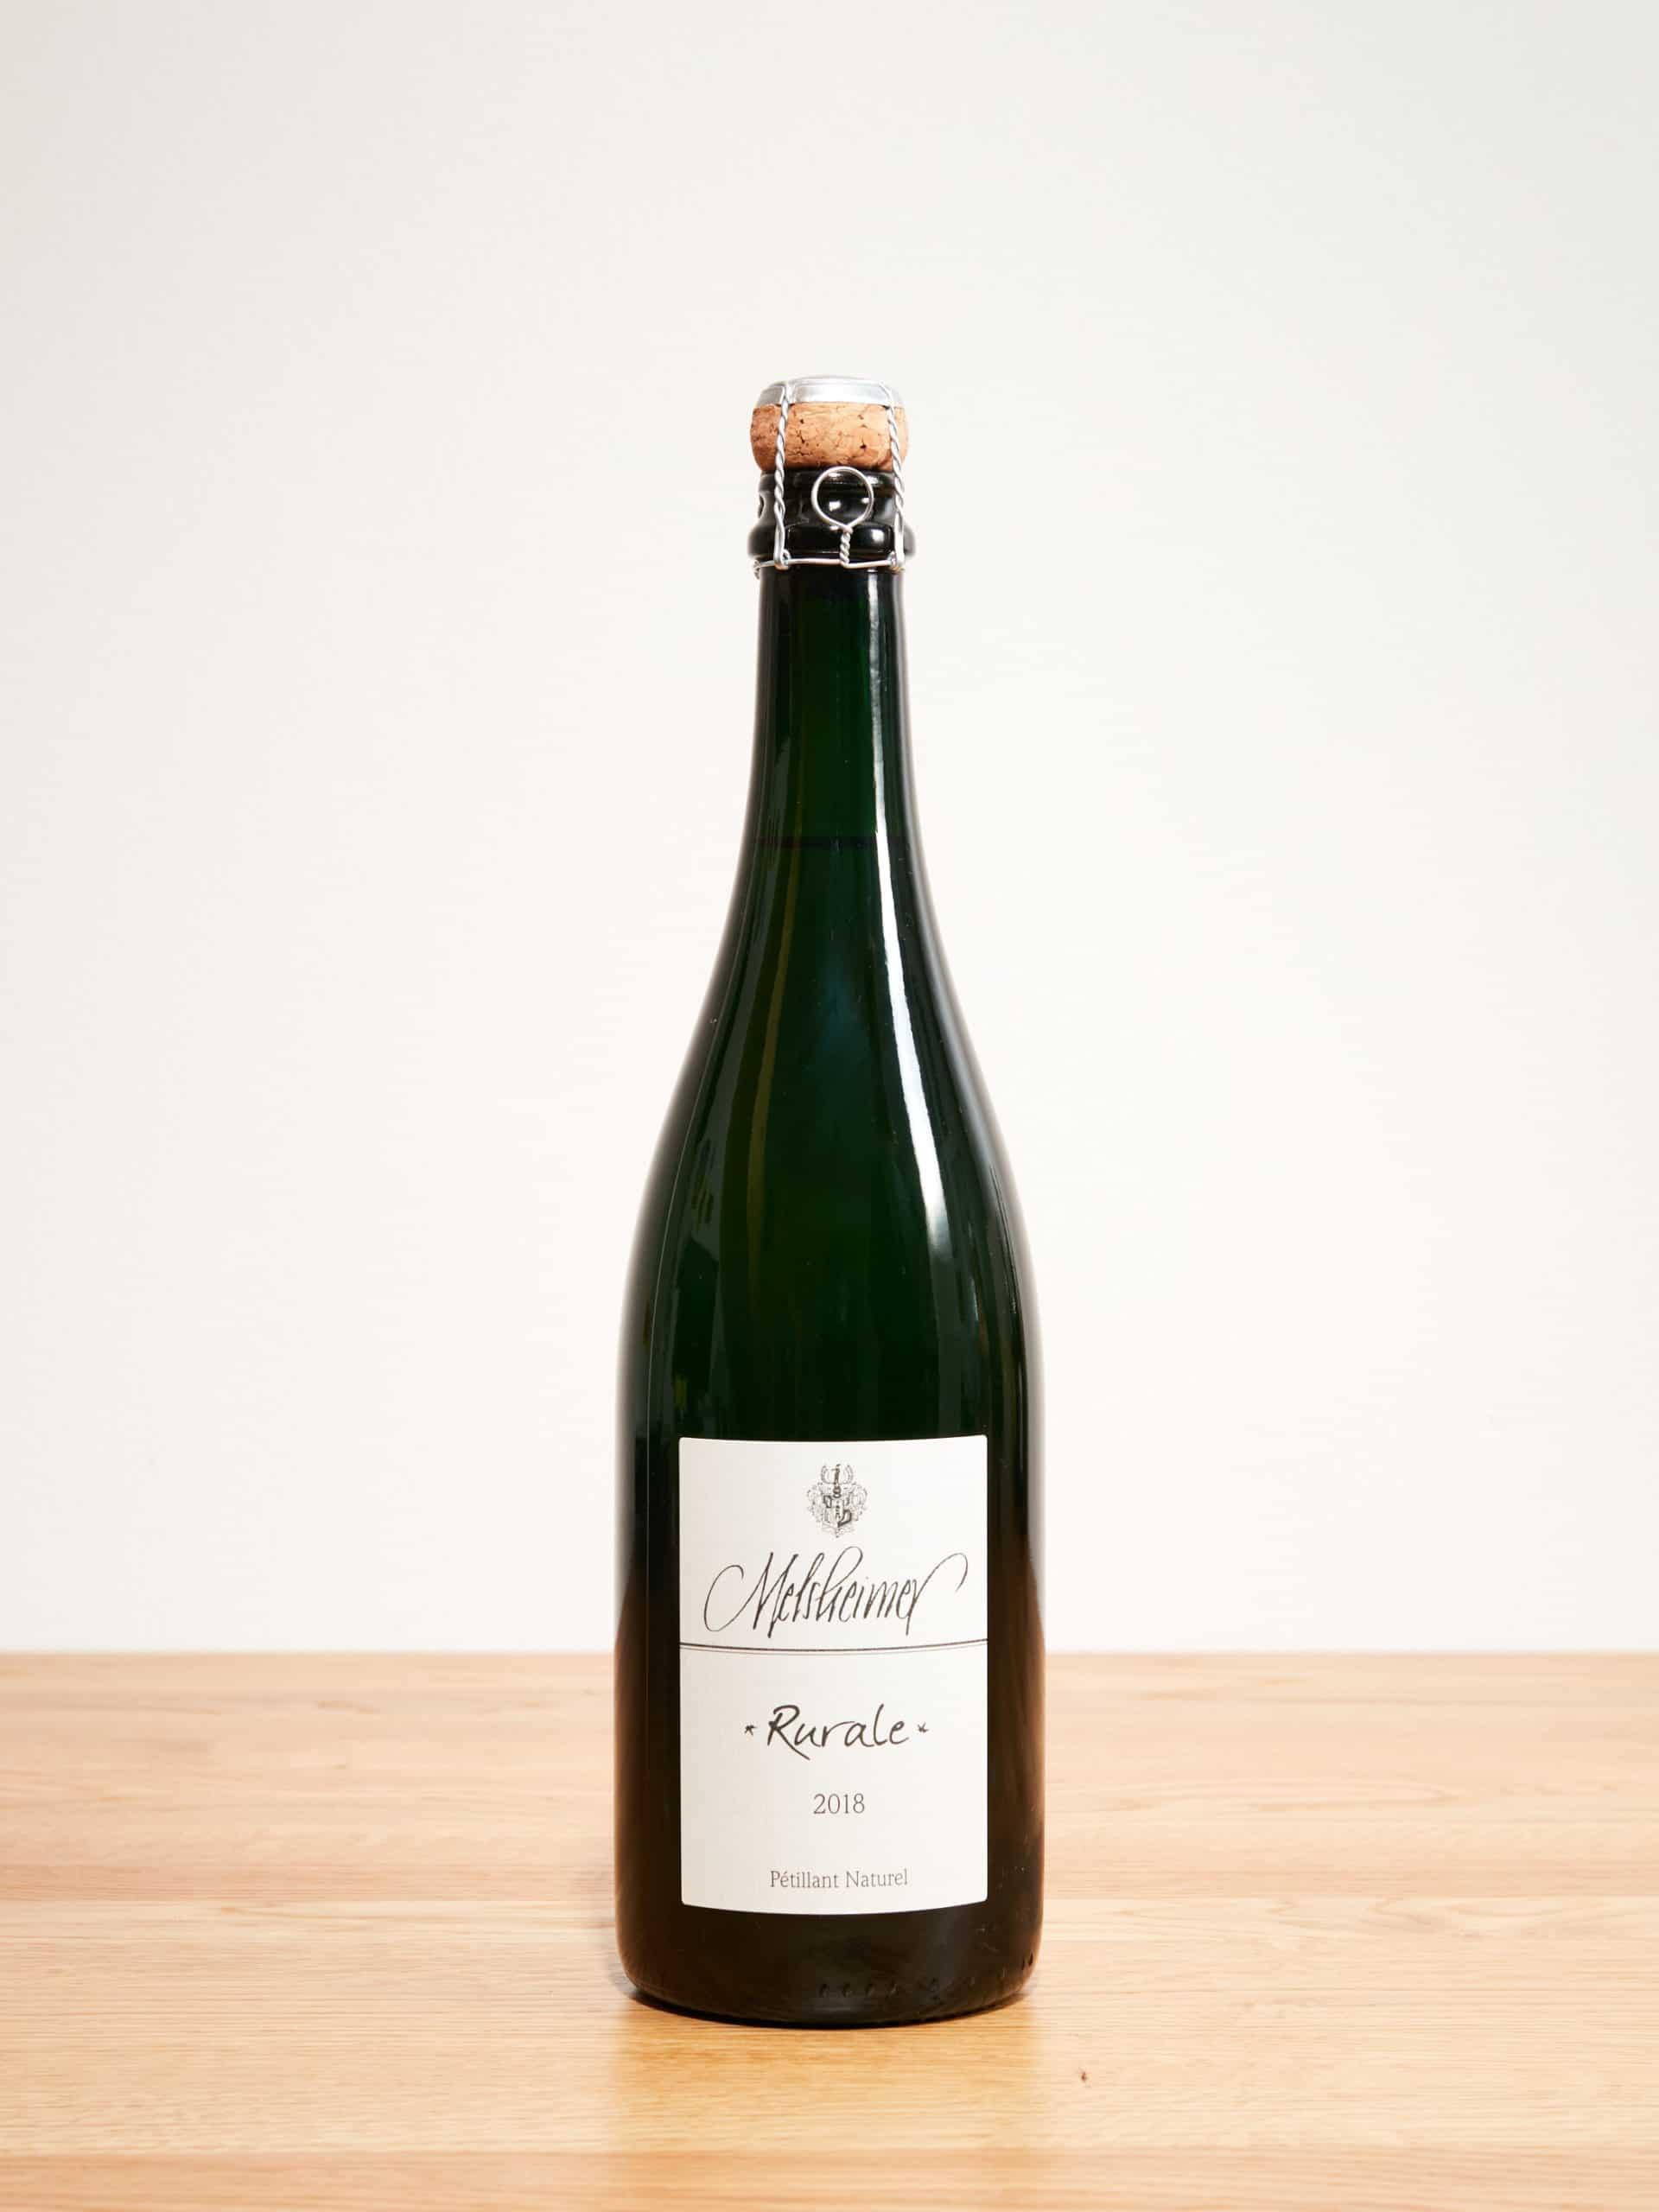 Melsheimer - Rurale Riesling PétNat 2018